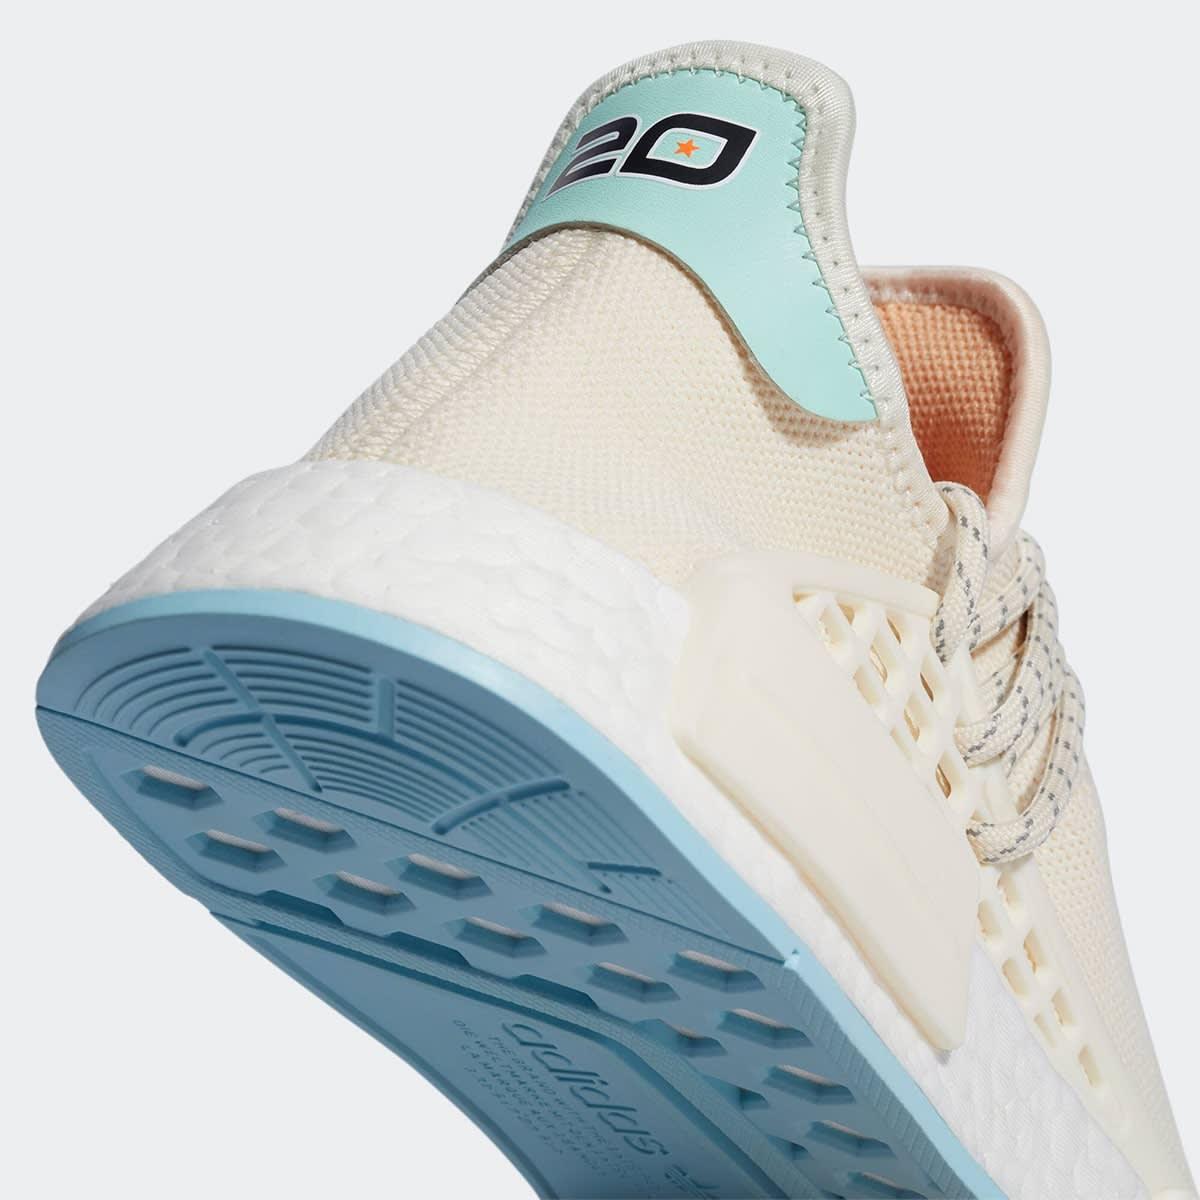 N.E.R.D x Adidas NMD Hu GW0246 Heel